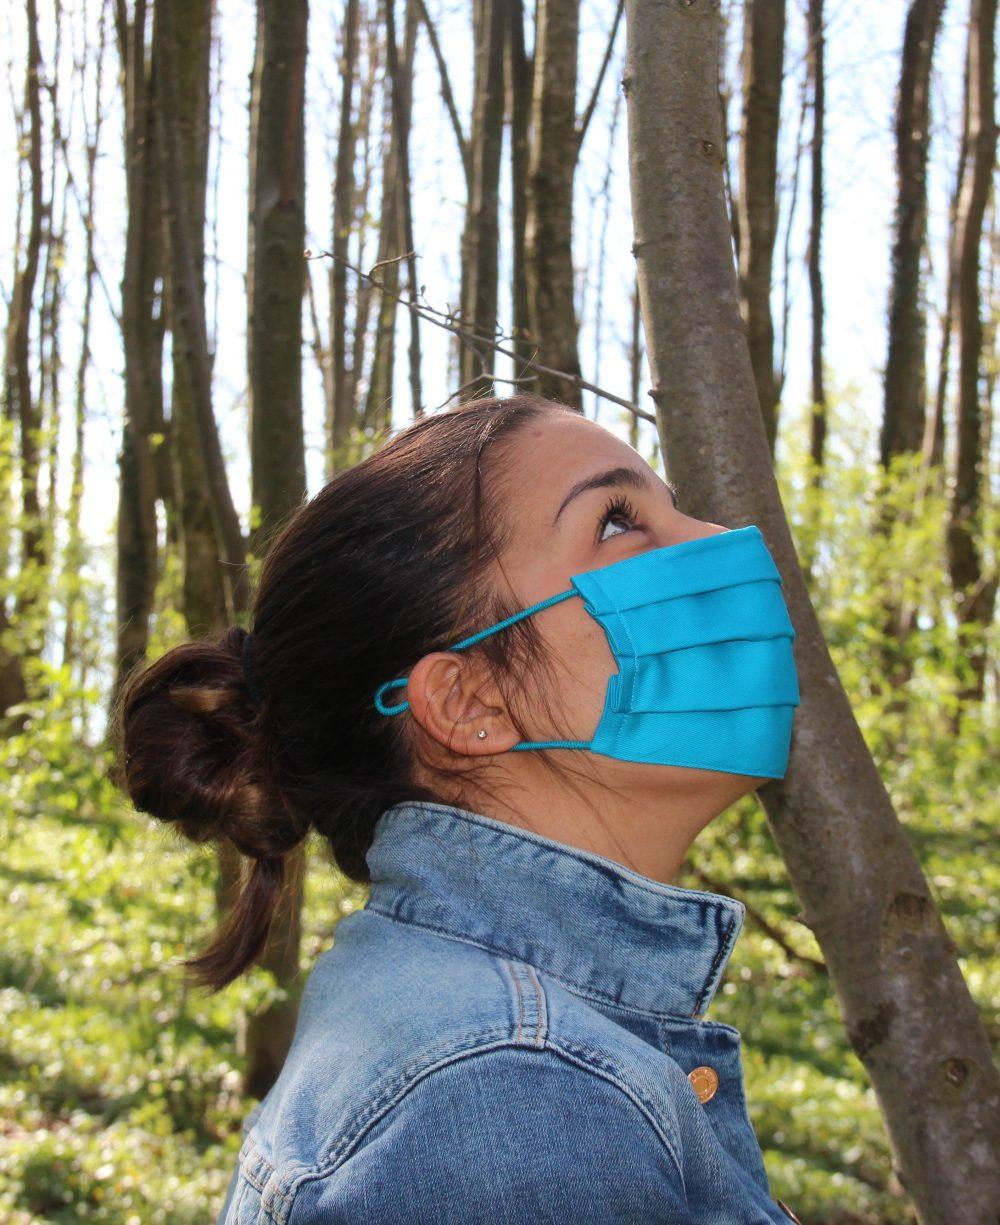 ozeanblau-Schnauferl-dialysebekleidung-diazipp